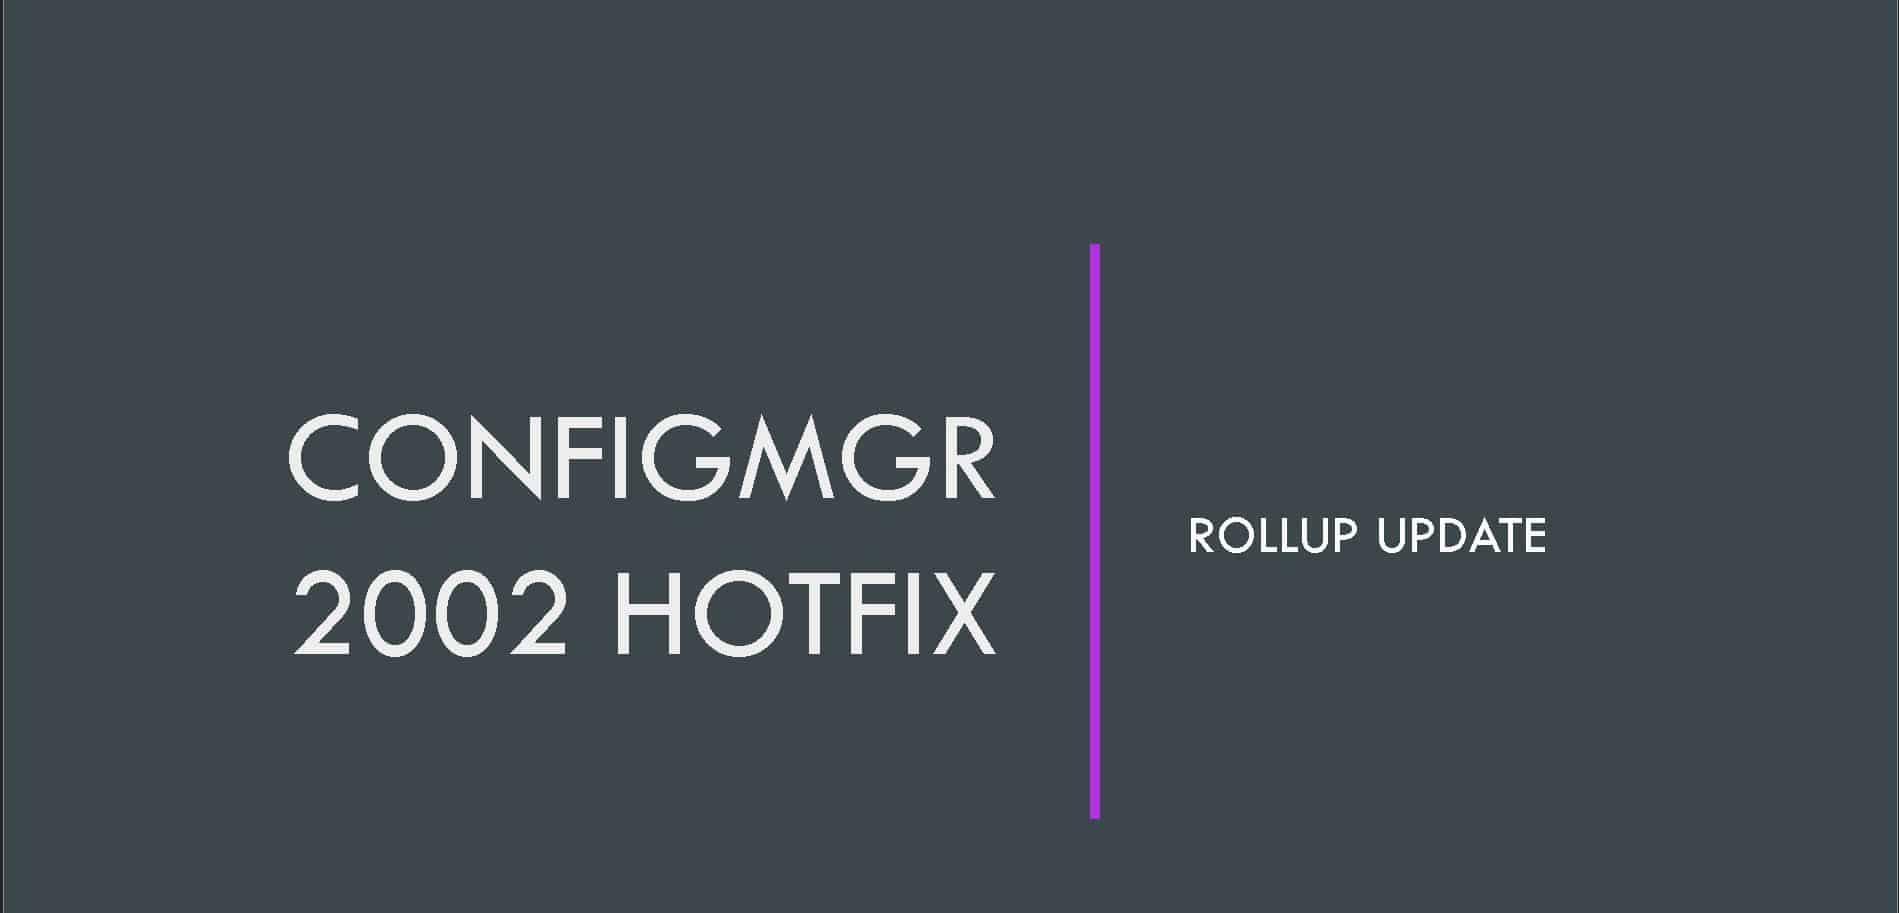 SCCM 2002 HotFix 4563473